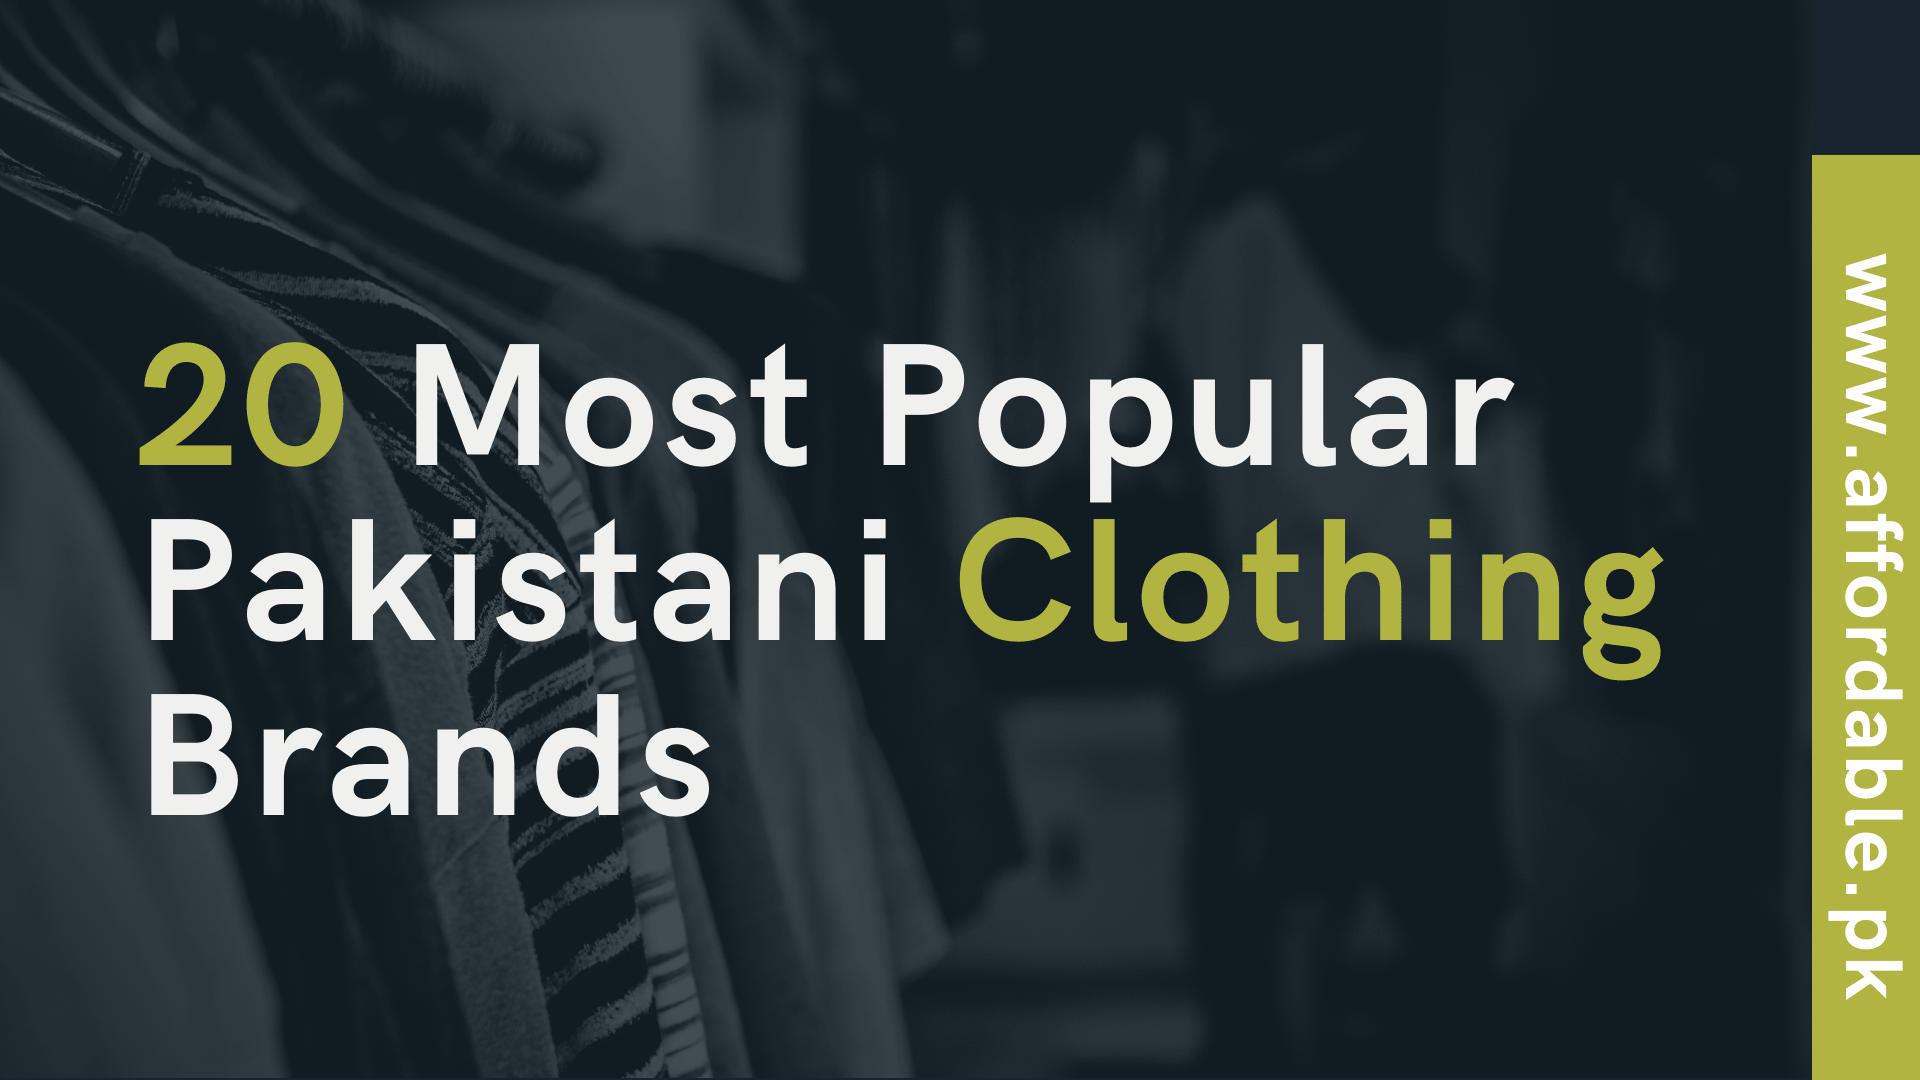 Top 20 Most Popular Pakistani Clothing Brands 2021